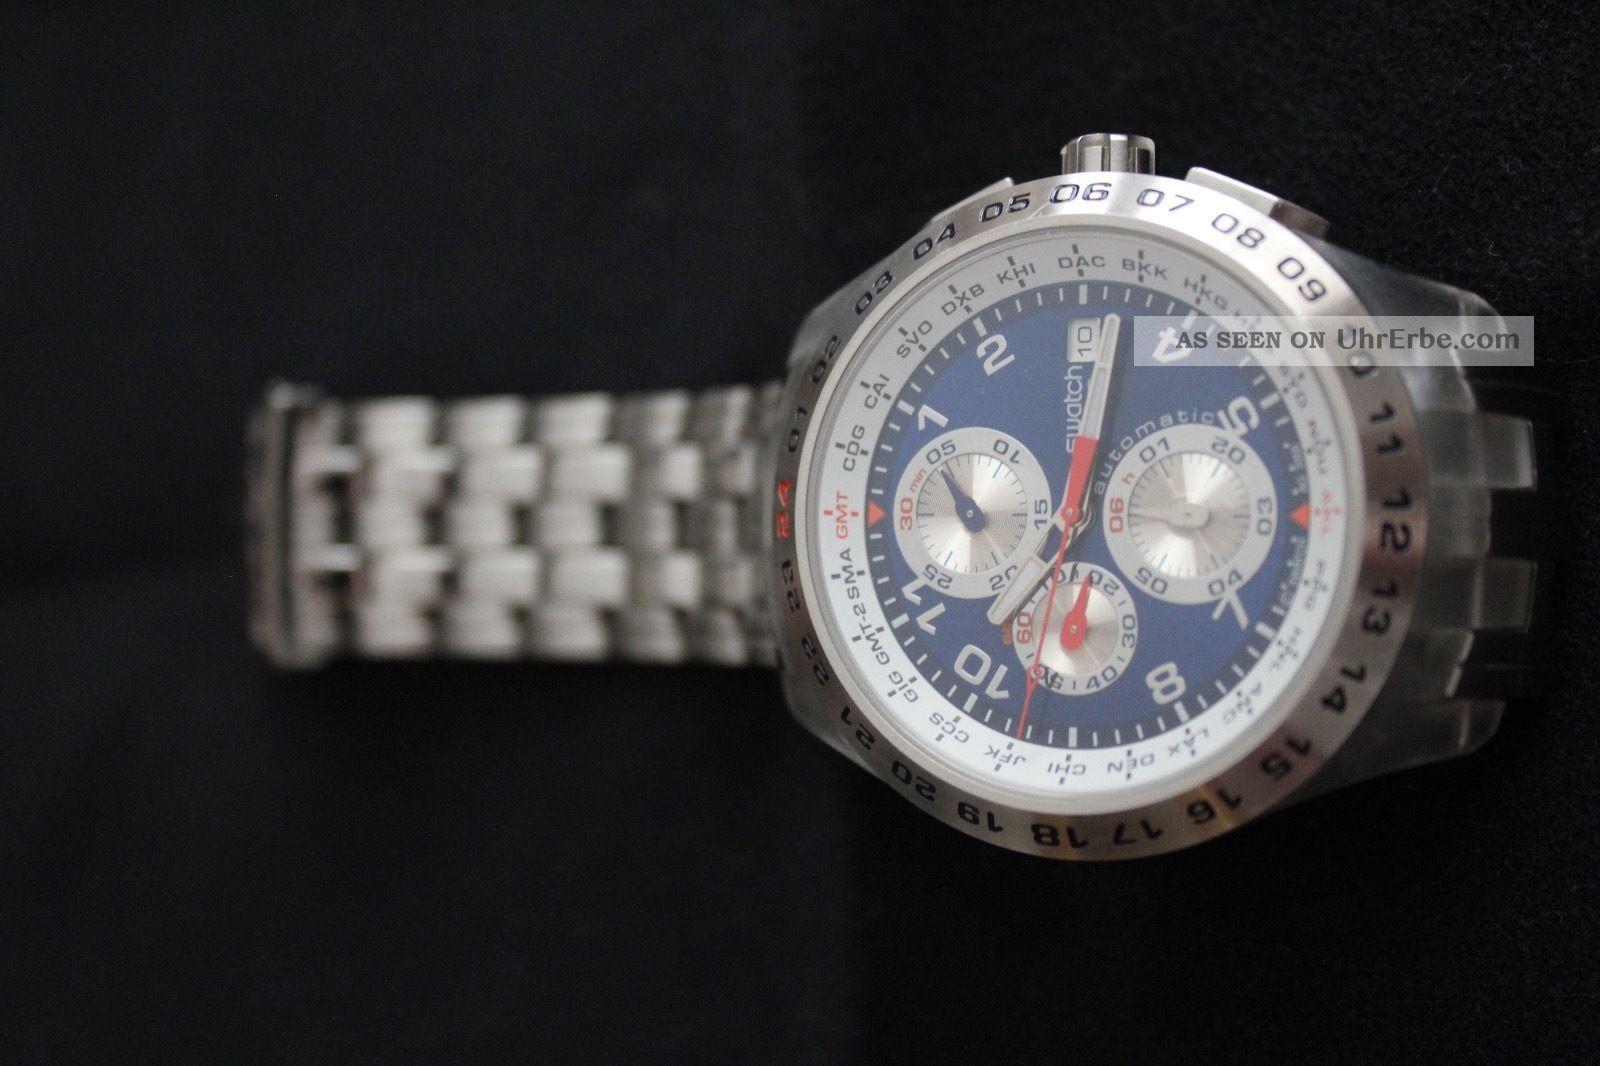 Swatch Irony Blunge - Svgk400g - Automatik Chronograph Armbanduhren Bild